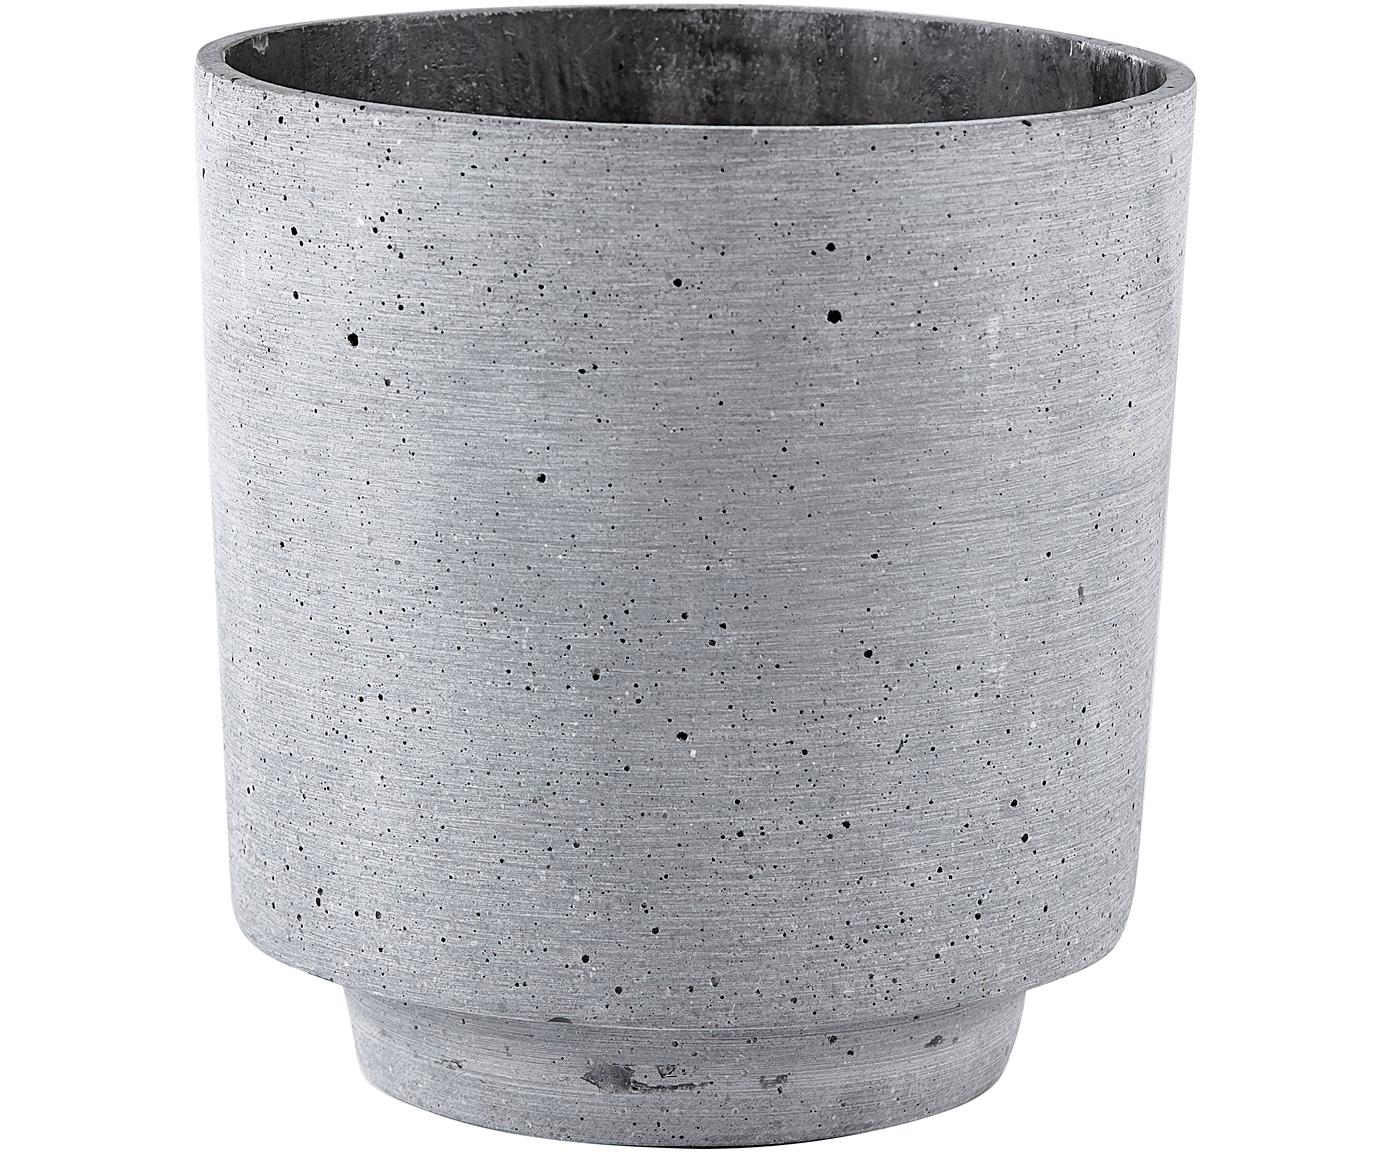 Macetero Pola, Fibra sintética, Gris, Ø 19 x Al 19 cm